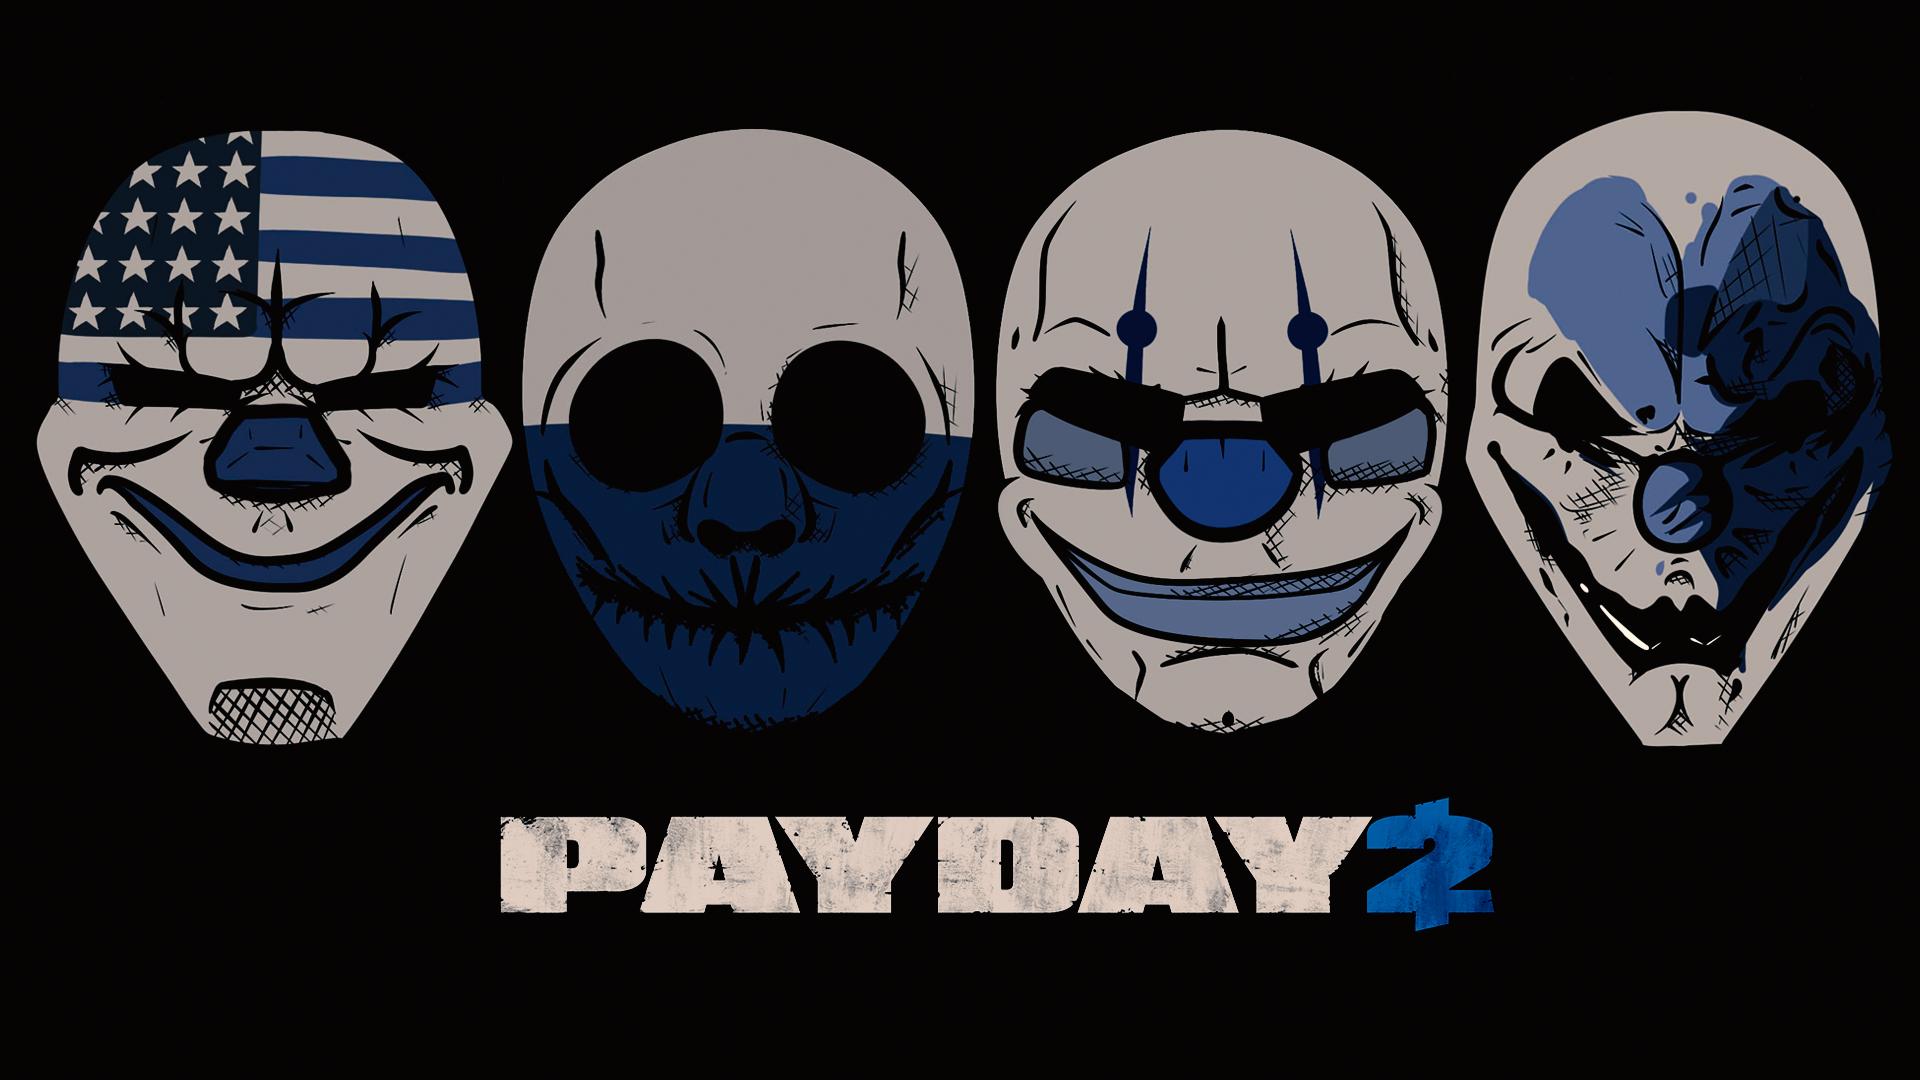 Payday 2 Wallpaper